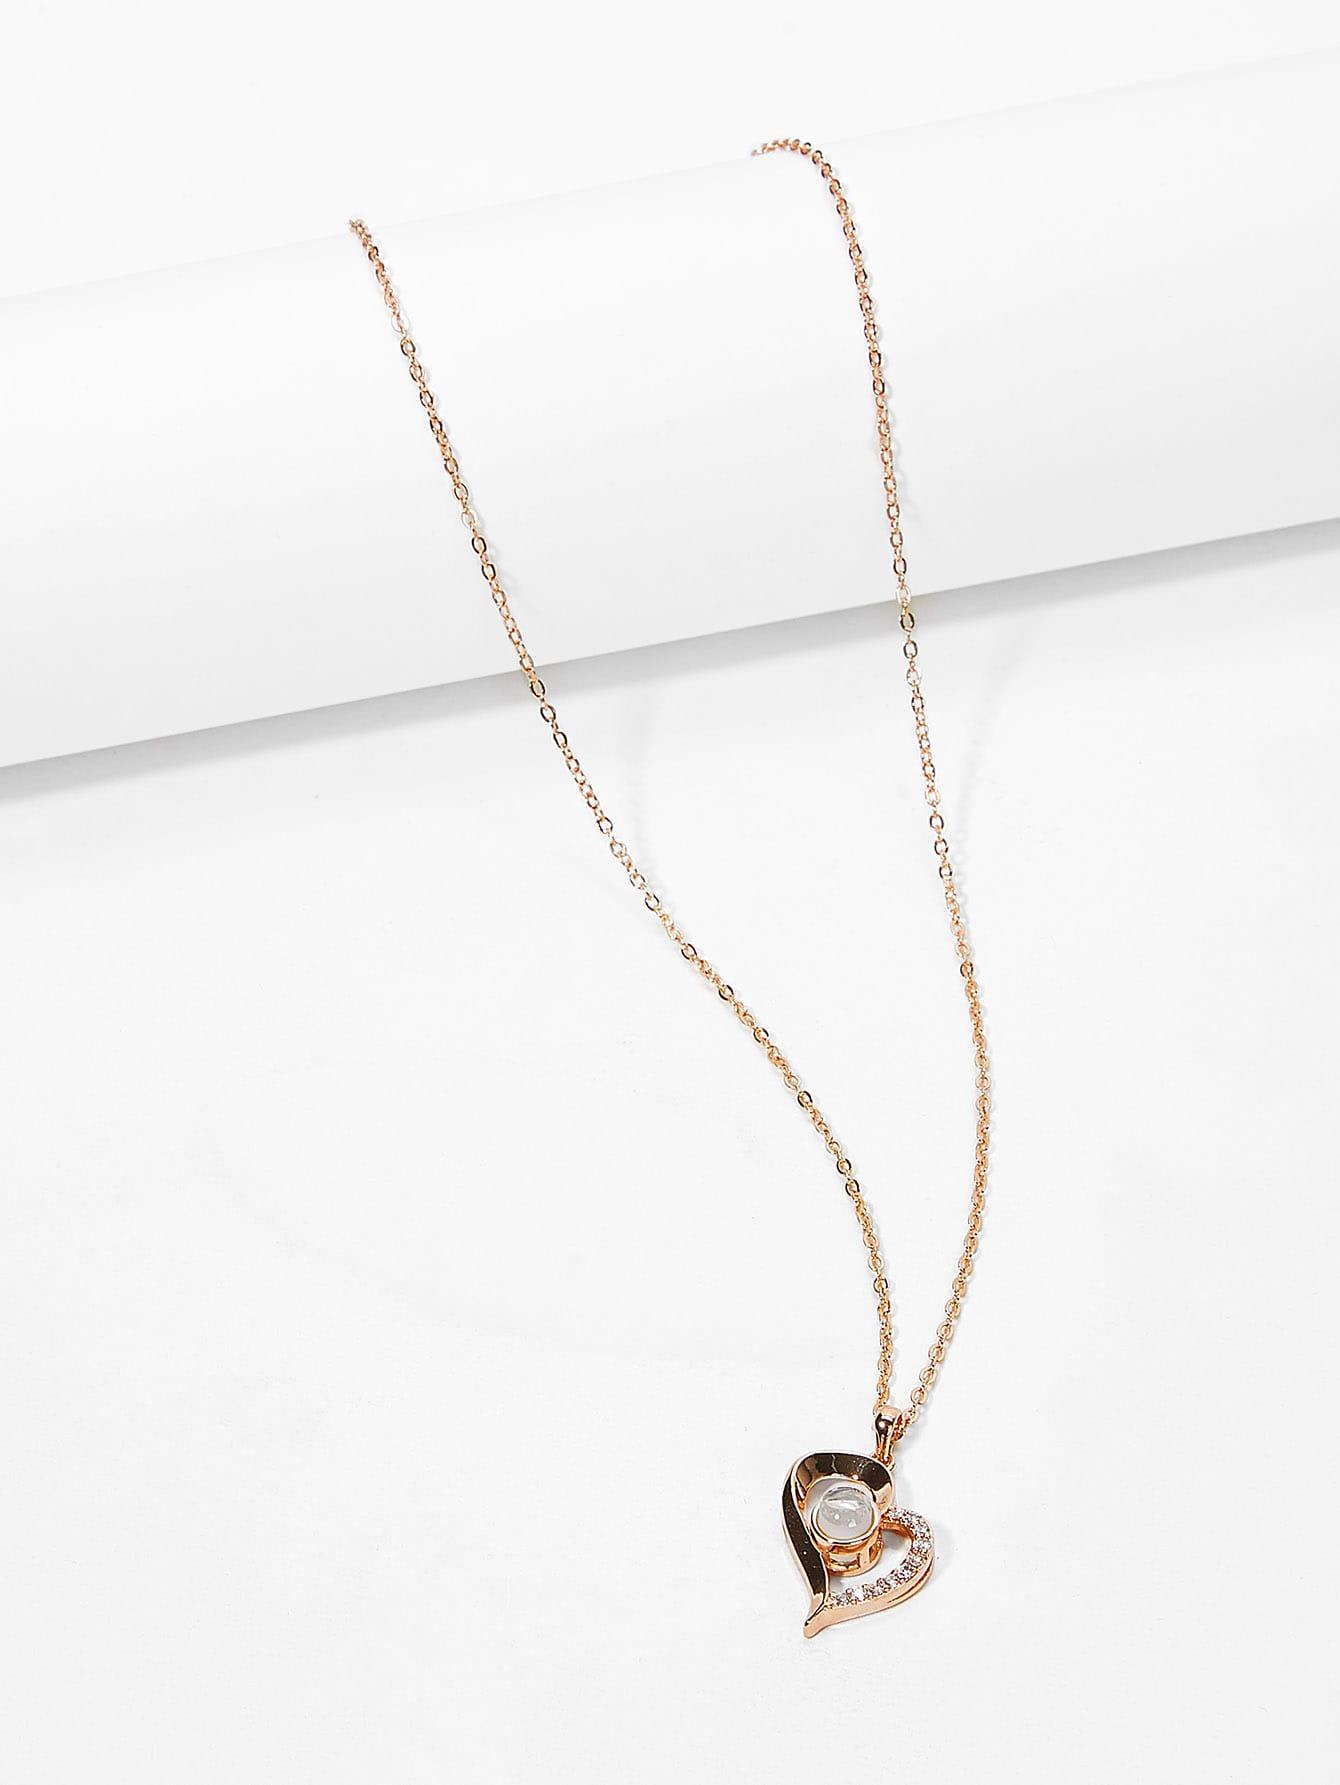 Light Projection Heart Pendant Necklace